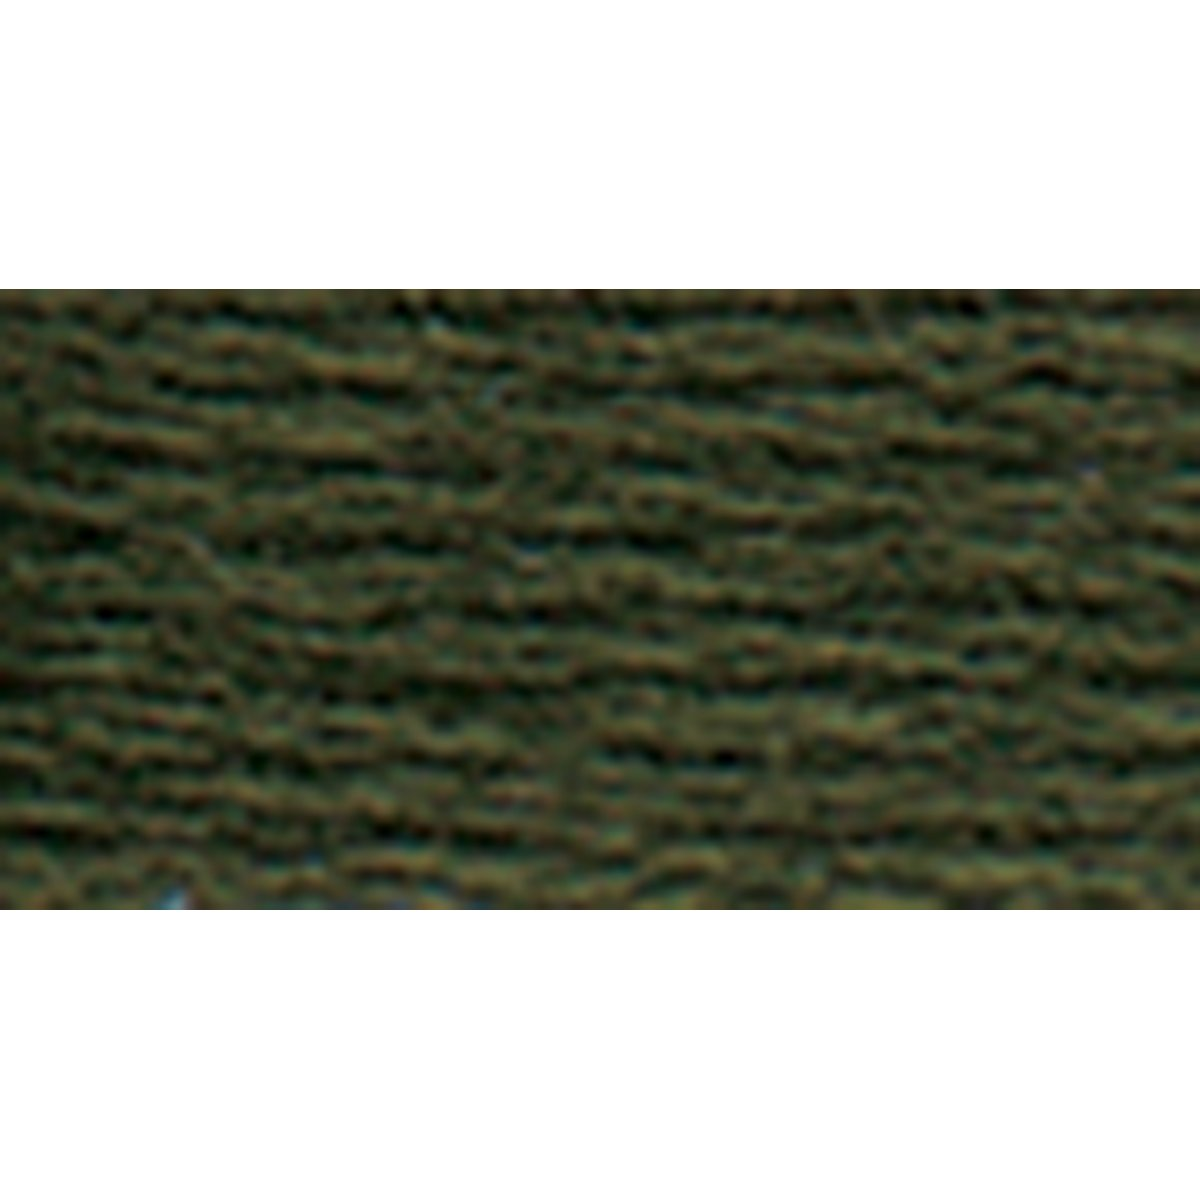 Black Avocado Green DMC 117-934 6 Strand Embroidery Cotton Floss 8.7-Yard